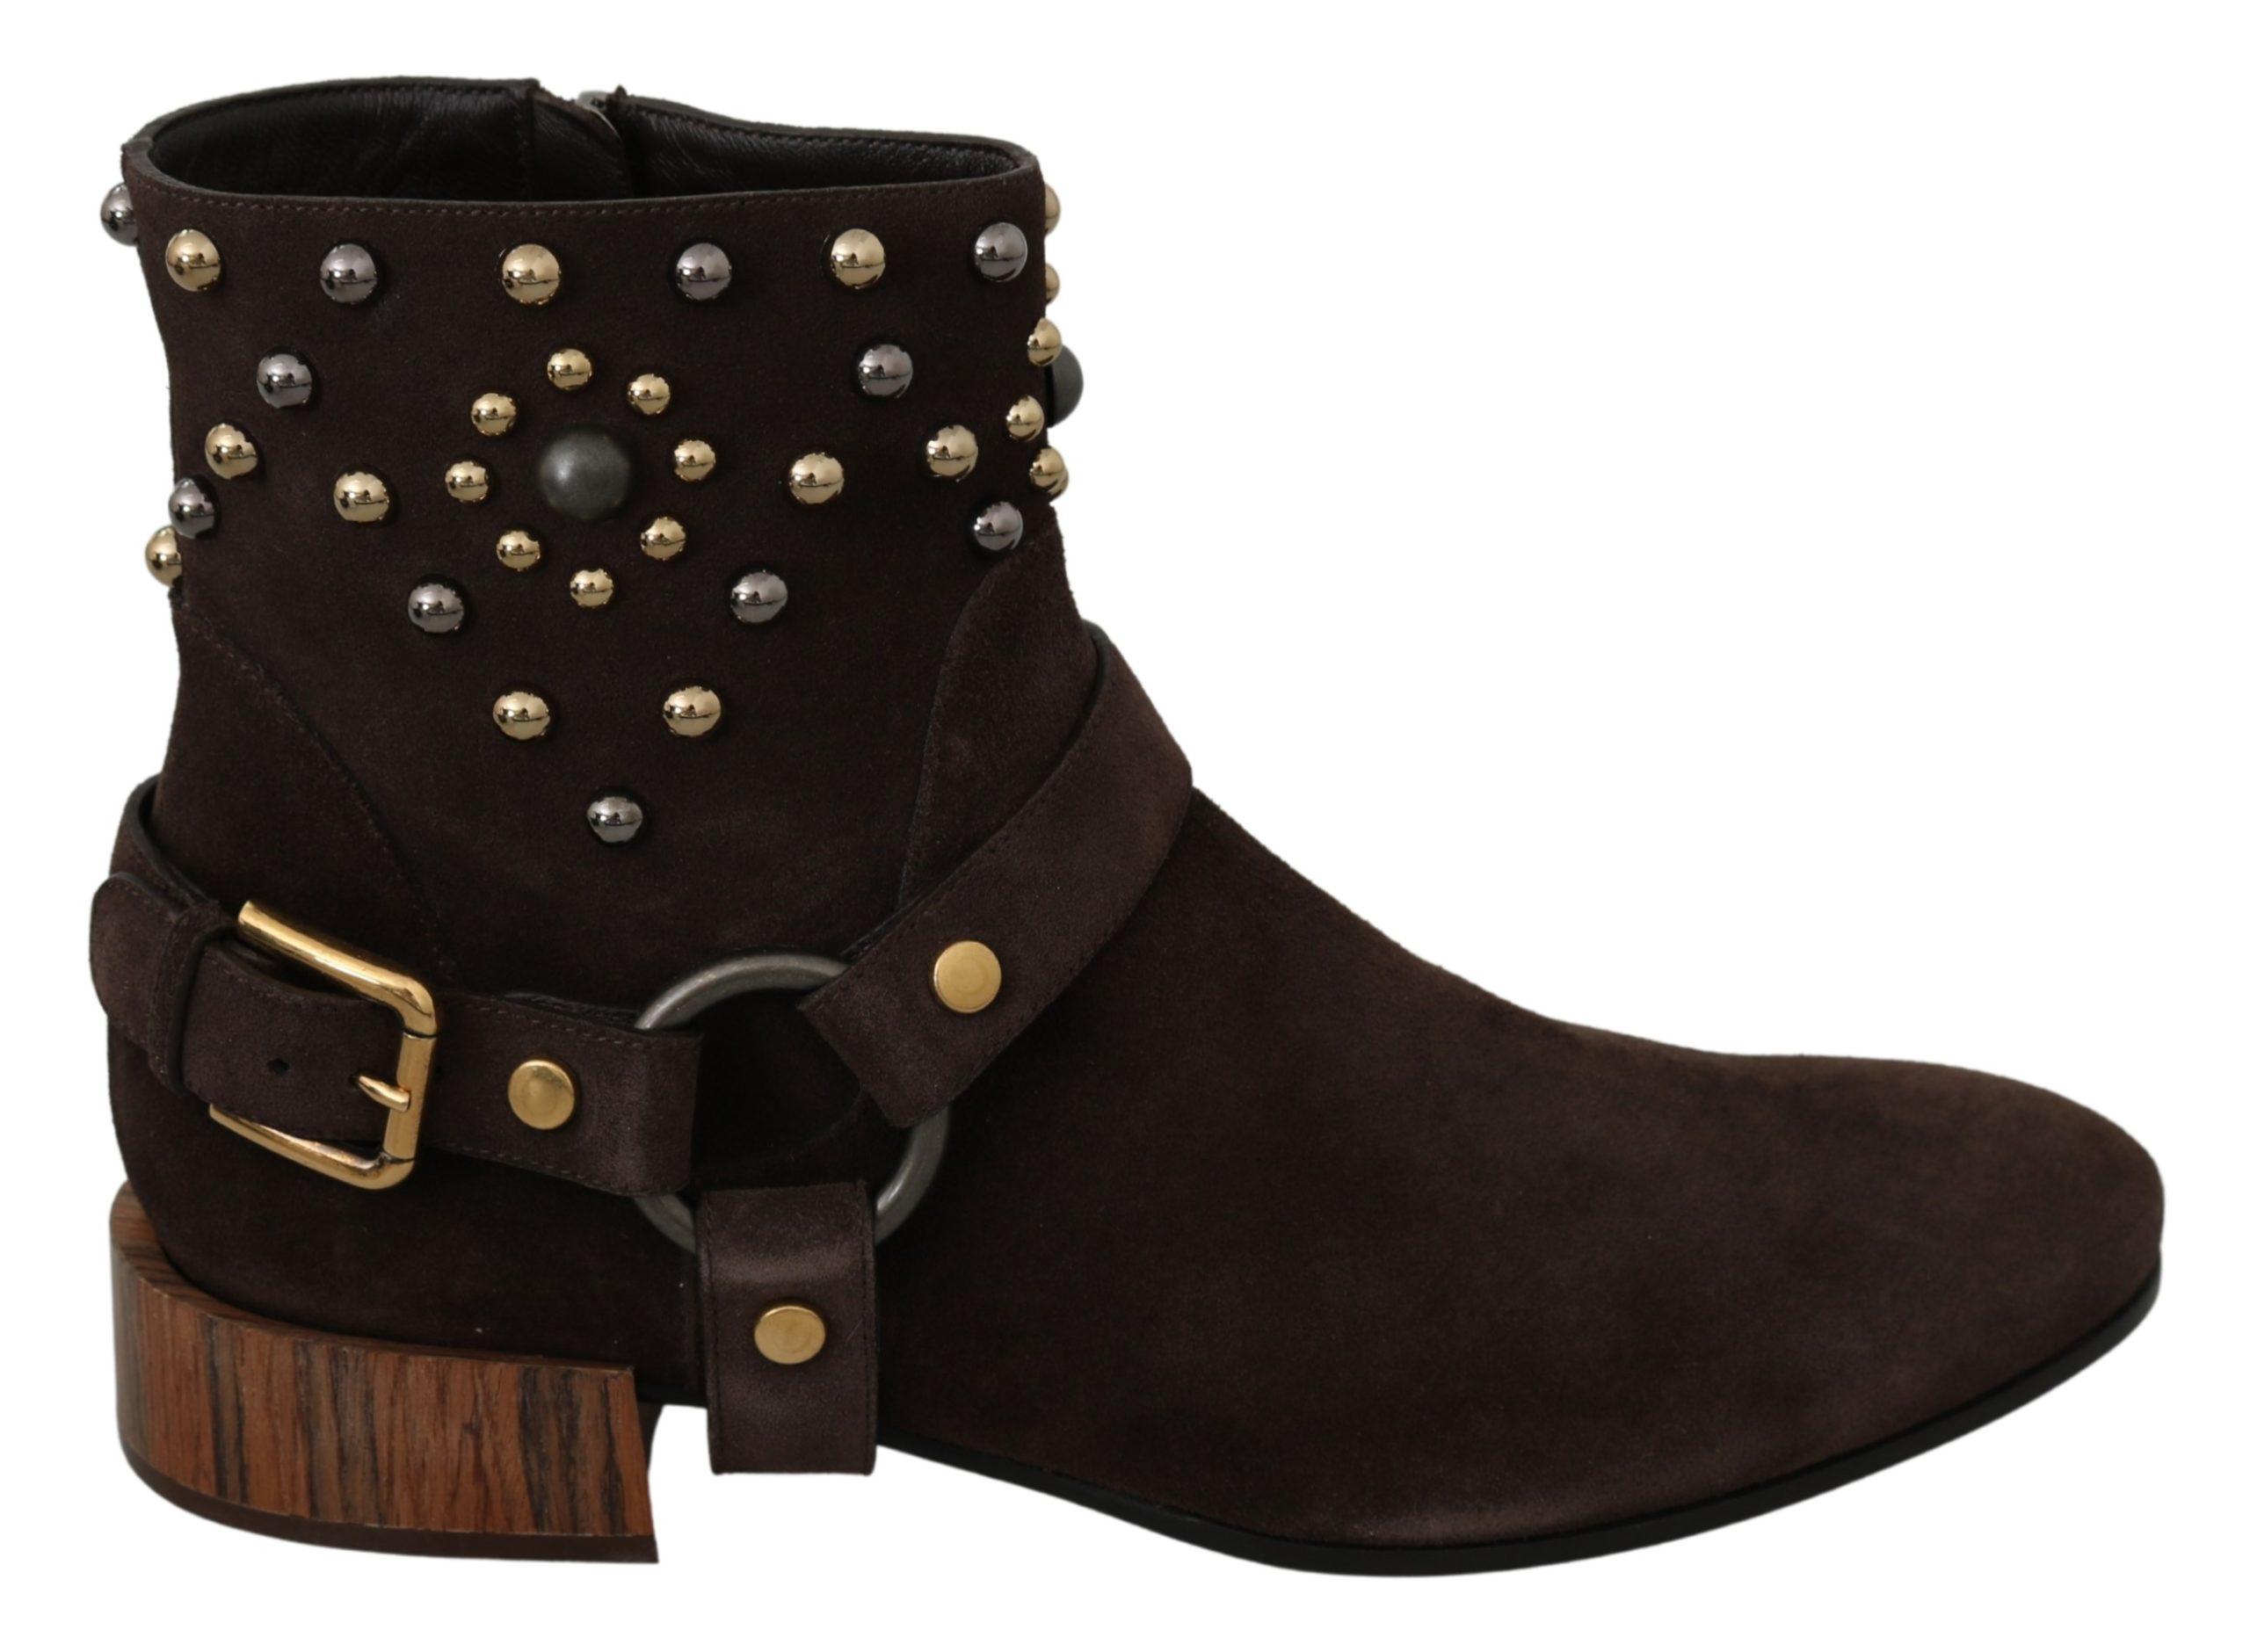 Dolce & Gabbana Women's Suede Studded Cowboy Boot Brown LA7050 - EU39/US8.5